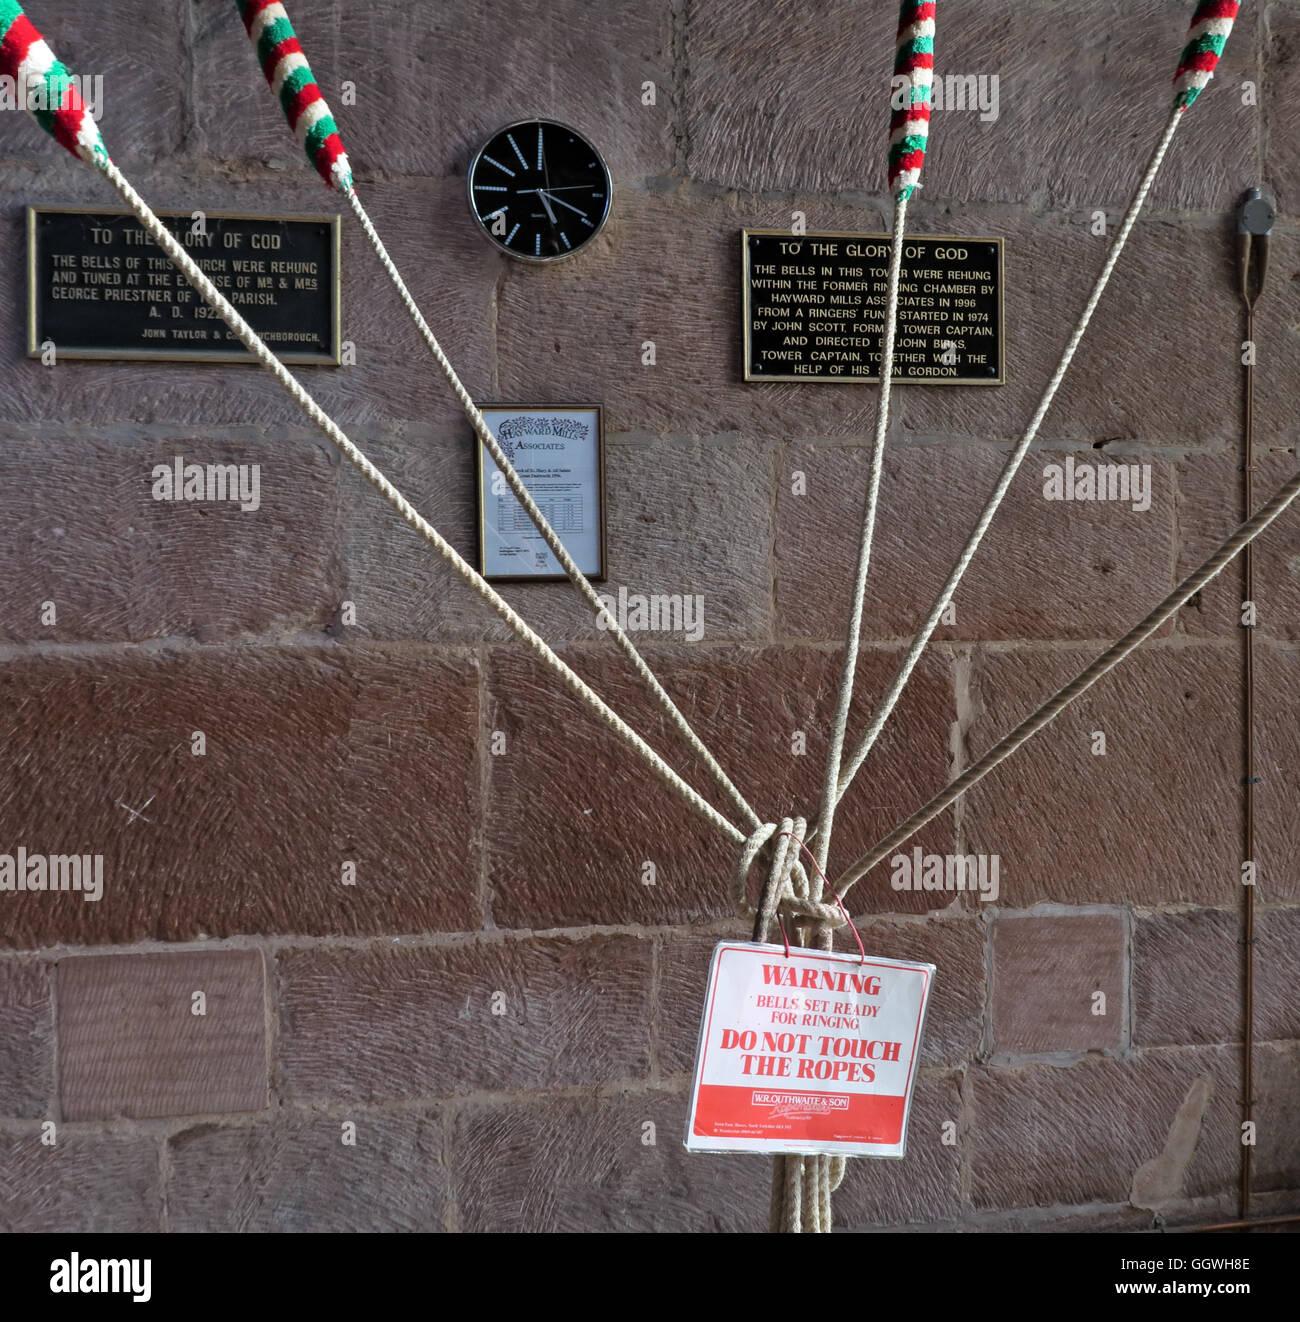 Laden Sie dieses Alamy Stockfoto Glocke Klingeln Seile, St. Marys Church, Gt Budworth, Cheshire, England, UK - GGWH8E